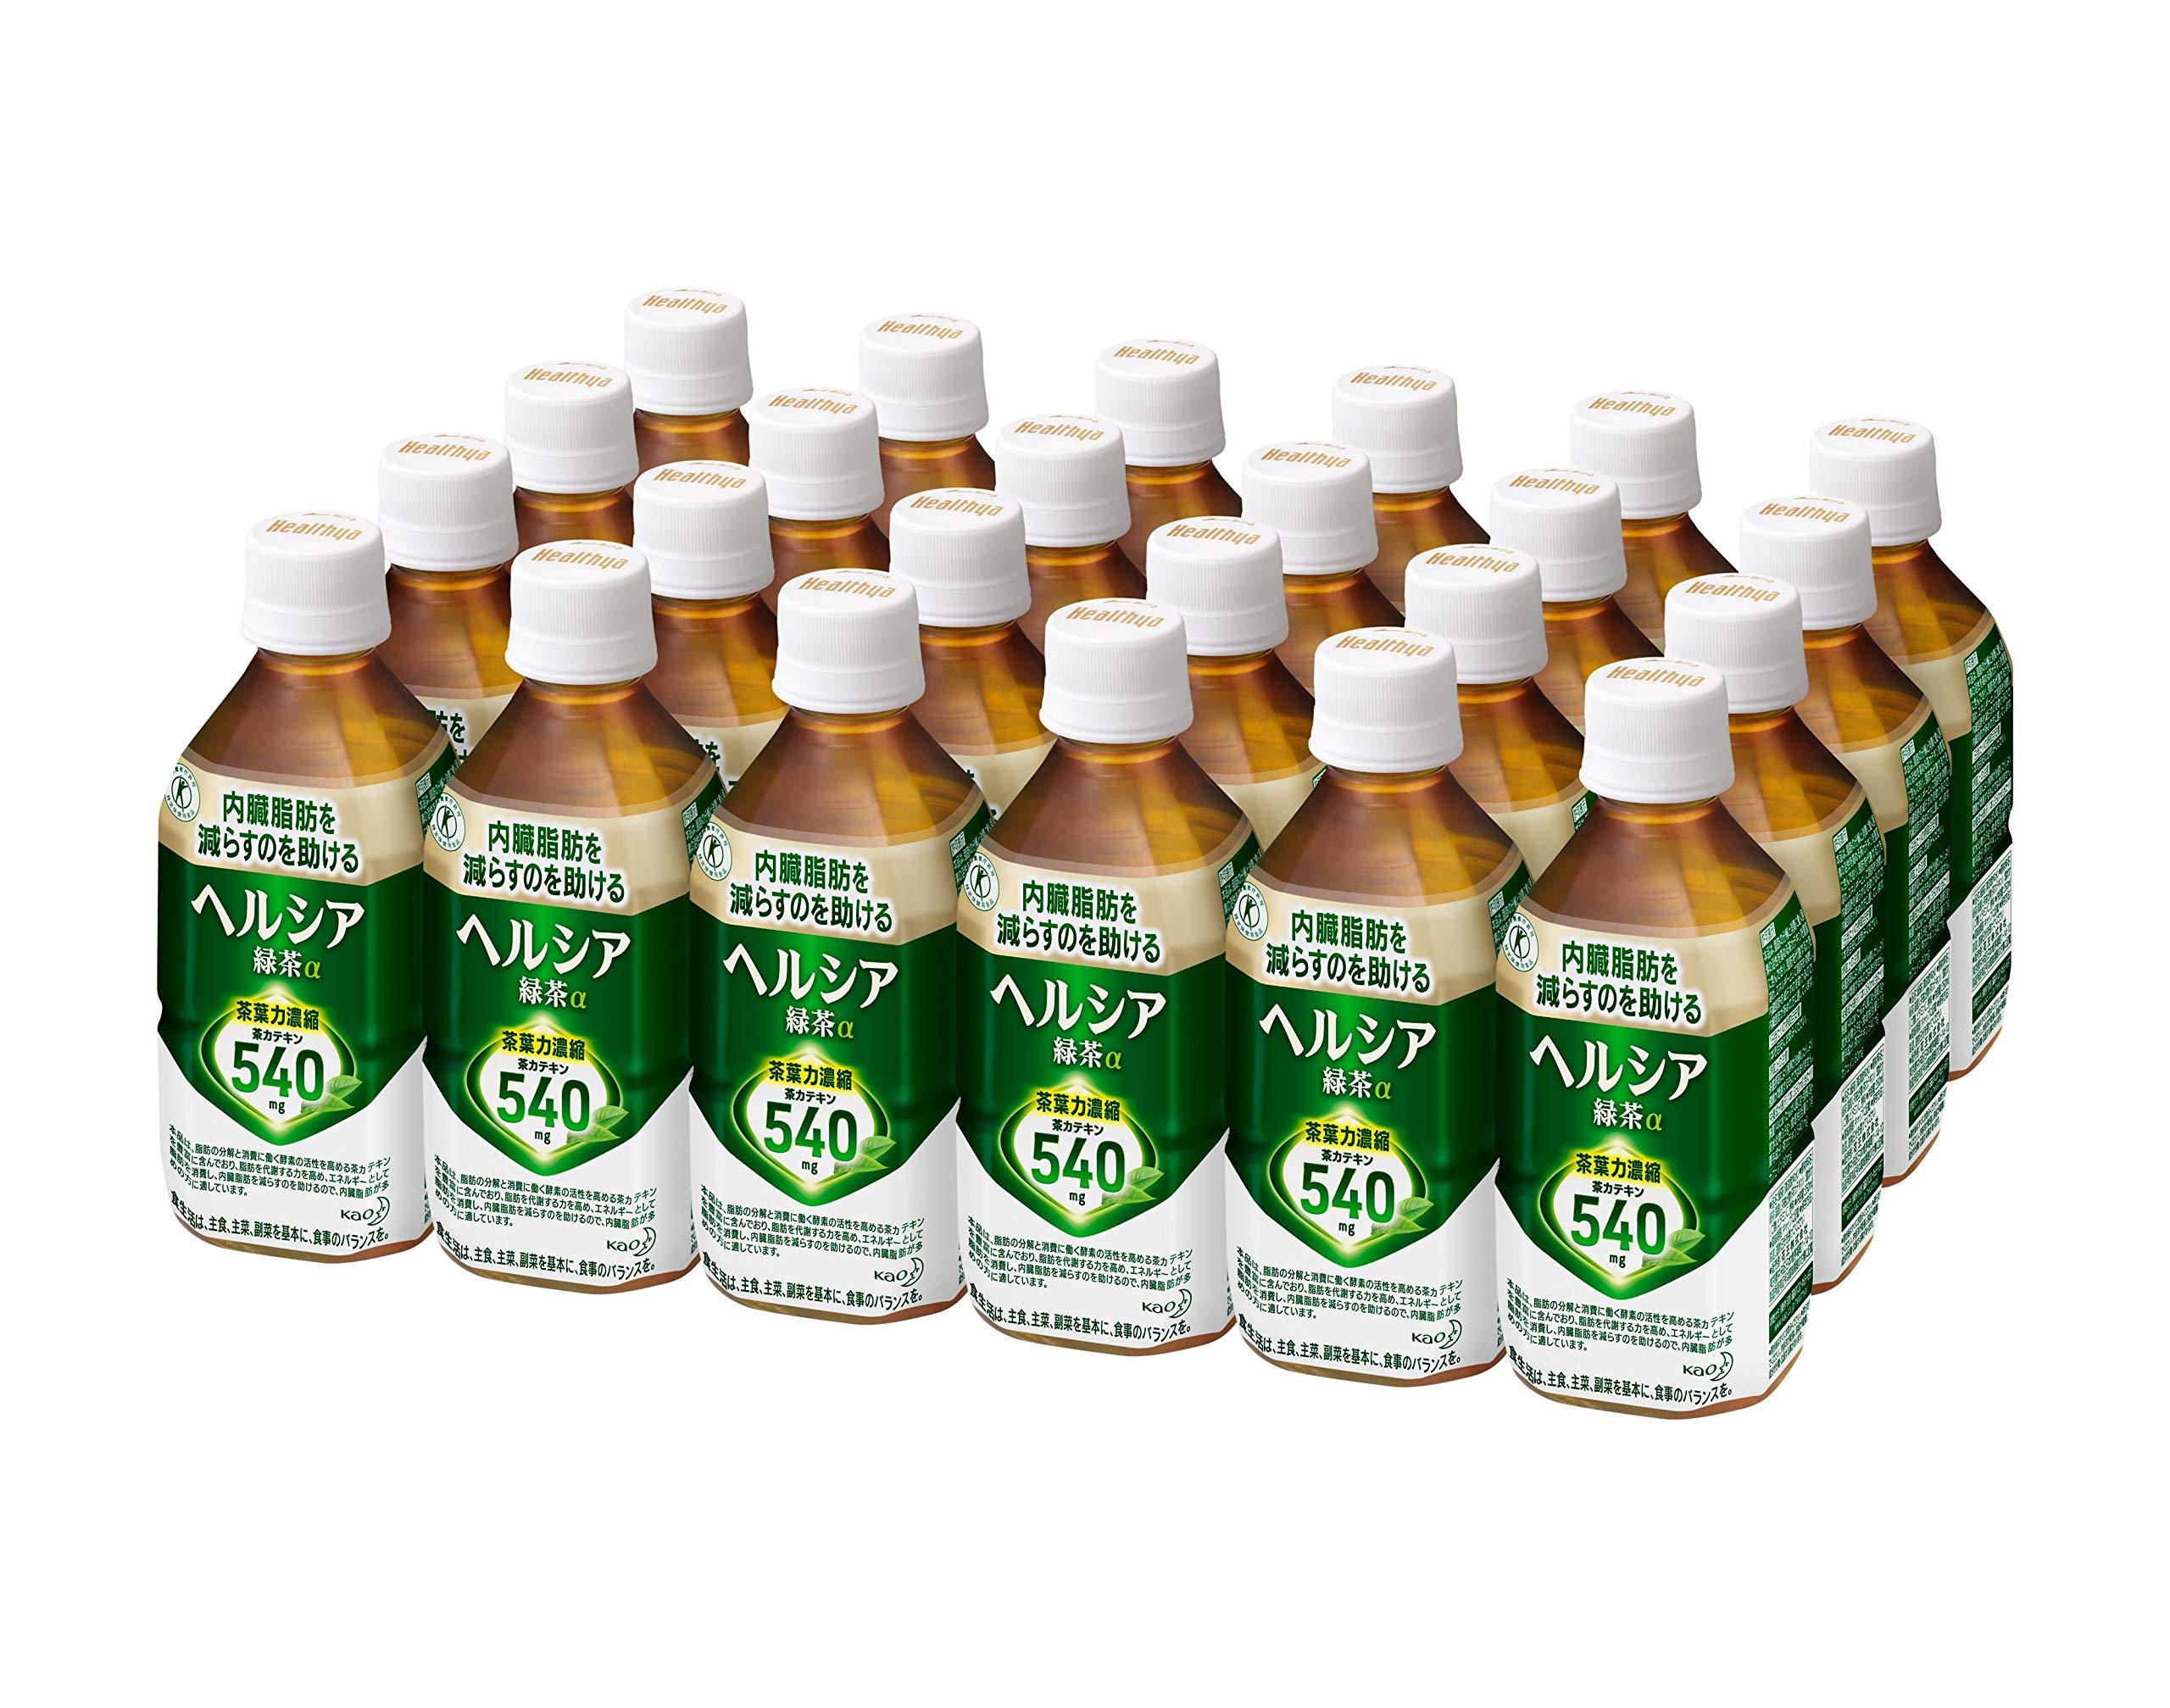 Healthia Green tea 350mlx24cansx1case